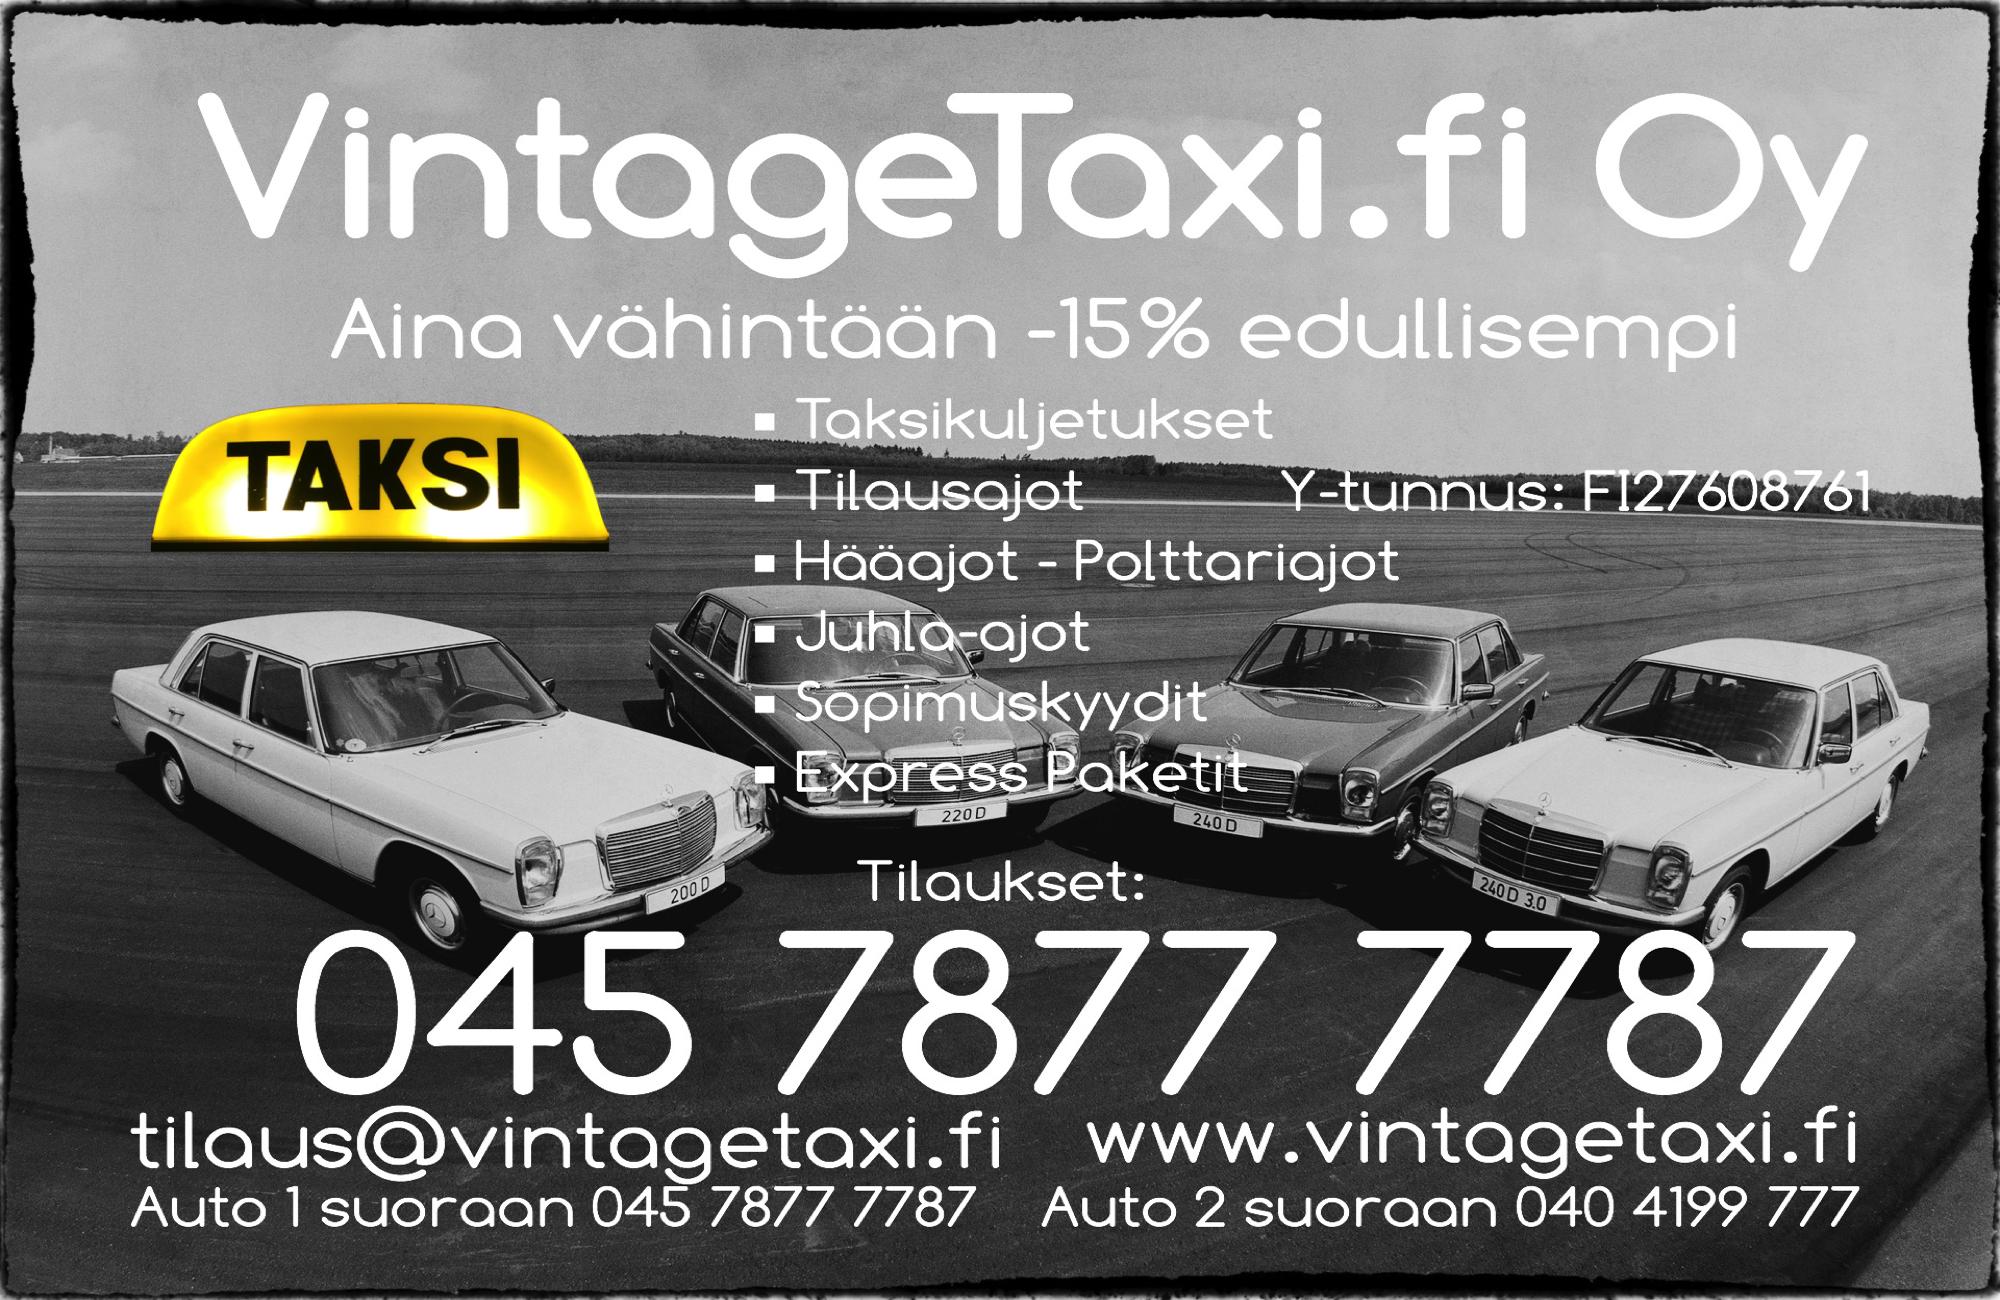 new_vintagetaxi_kayntikortti_with_taksisign_2000x1300_snapseed_gray